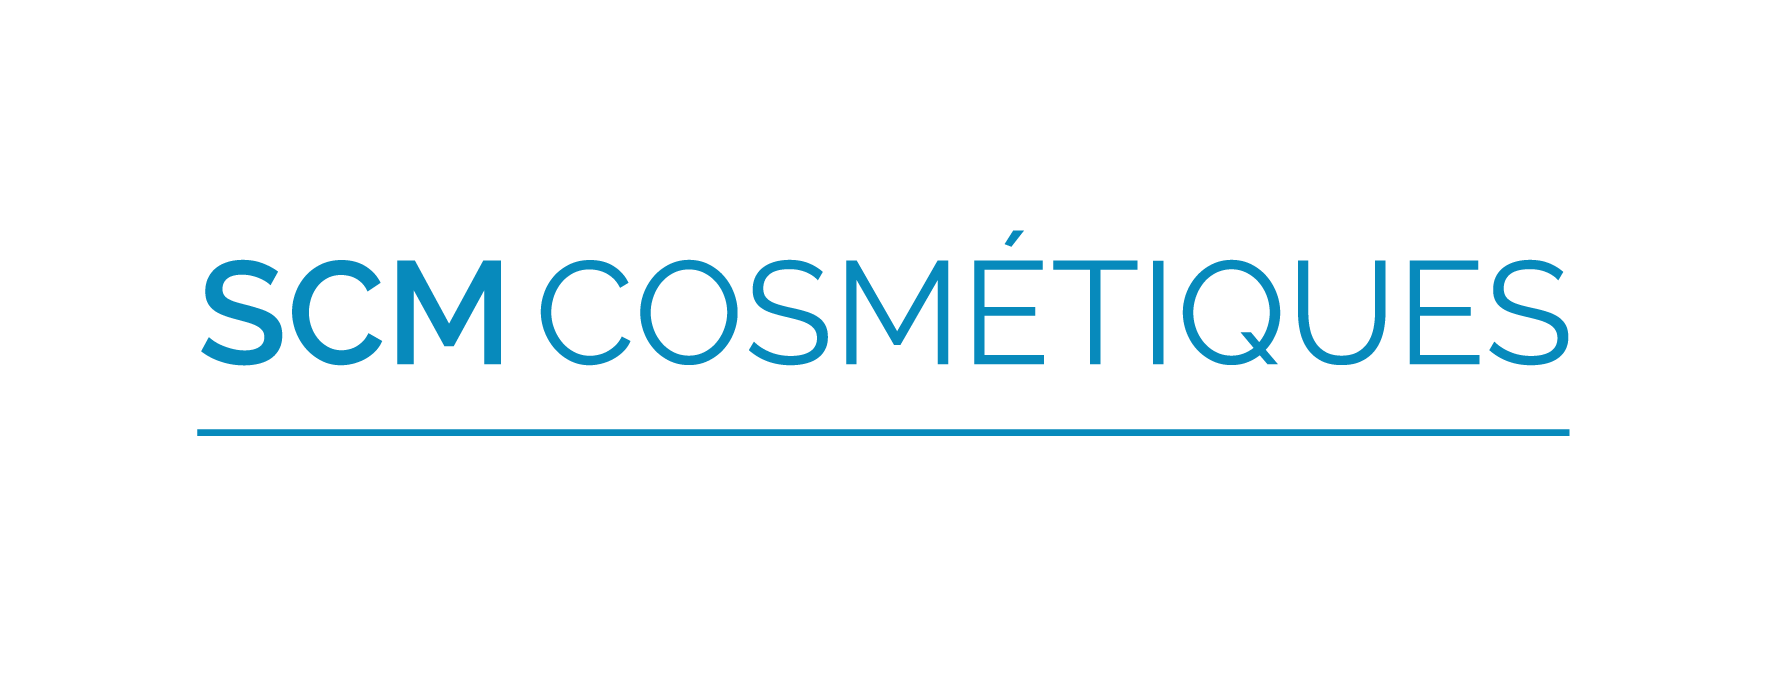 SCM Cosmetiques